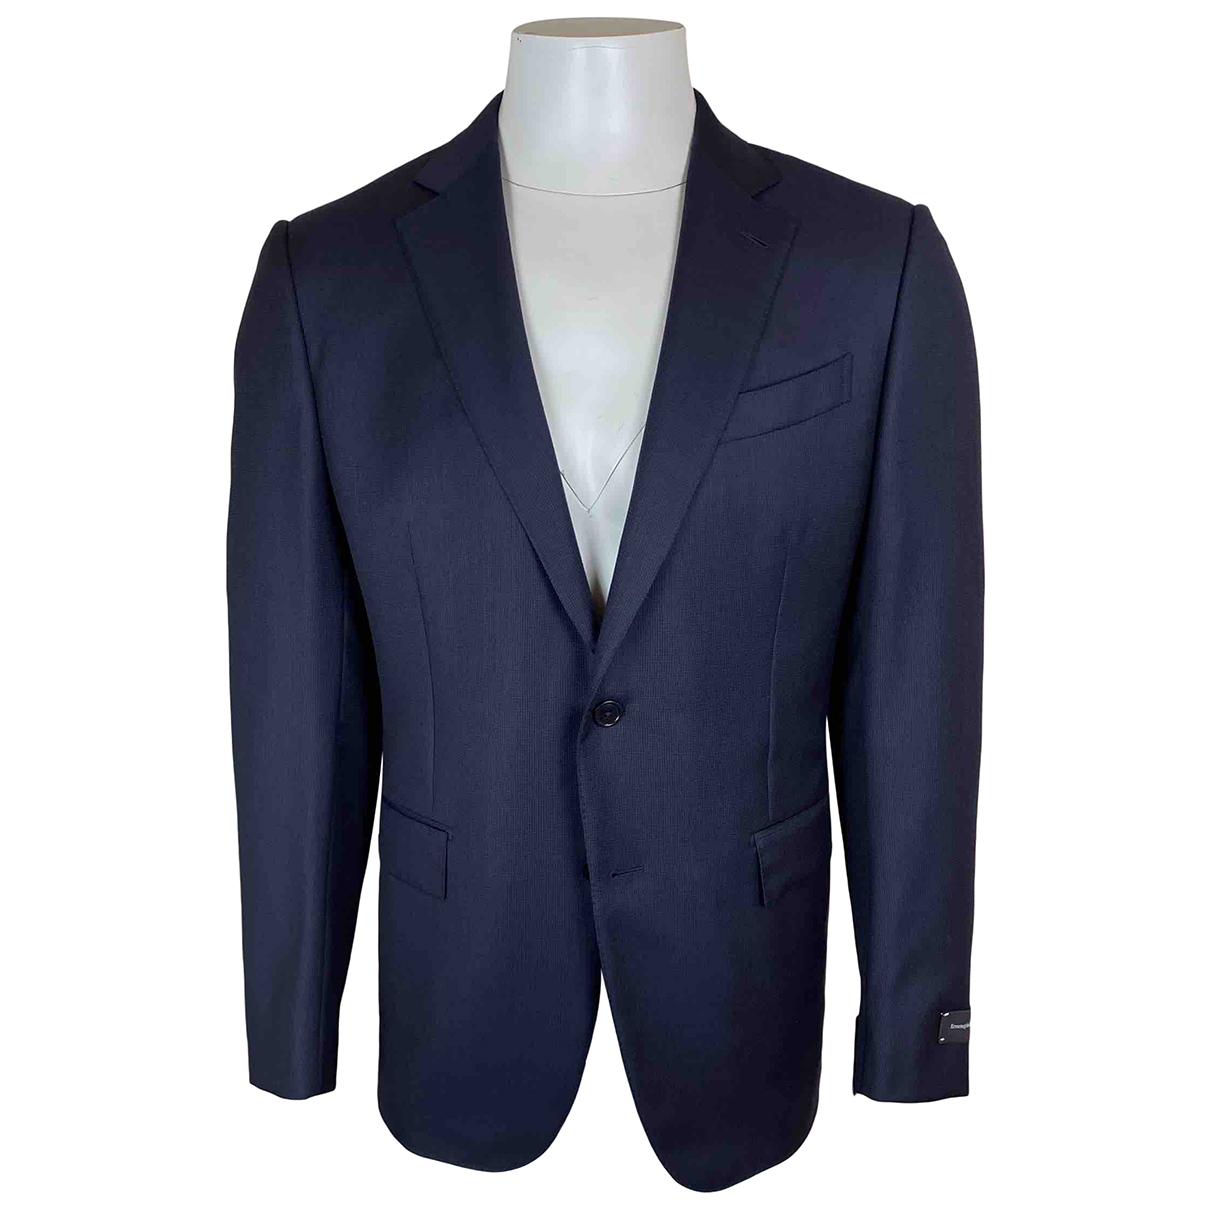 Ermenegildo Zegna N Navy Wool Suits for Men 52 IT